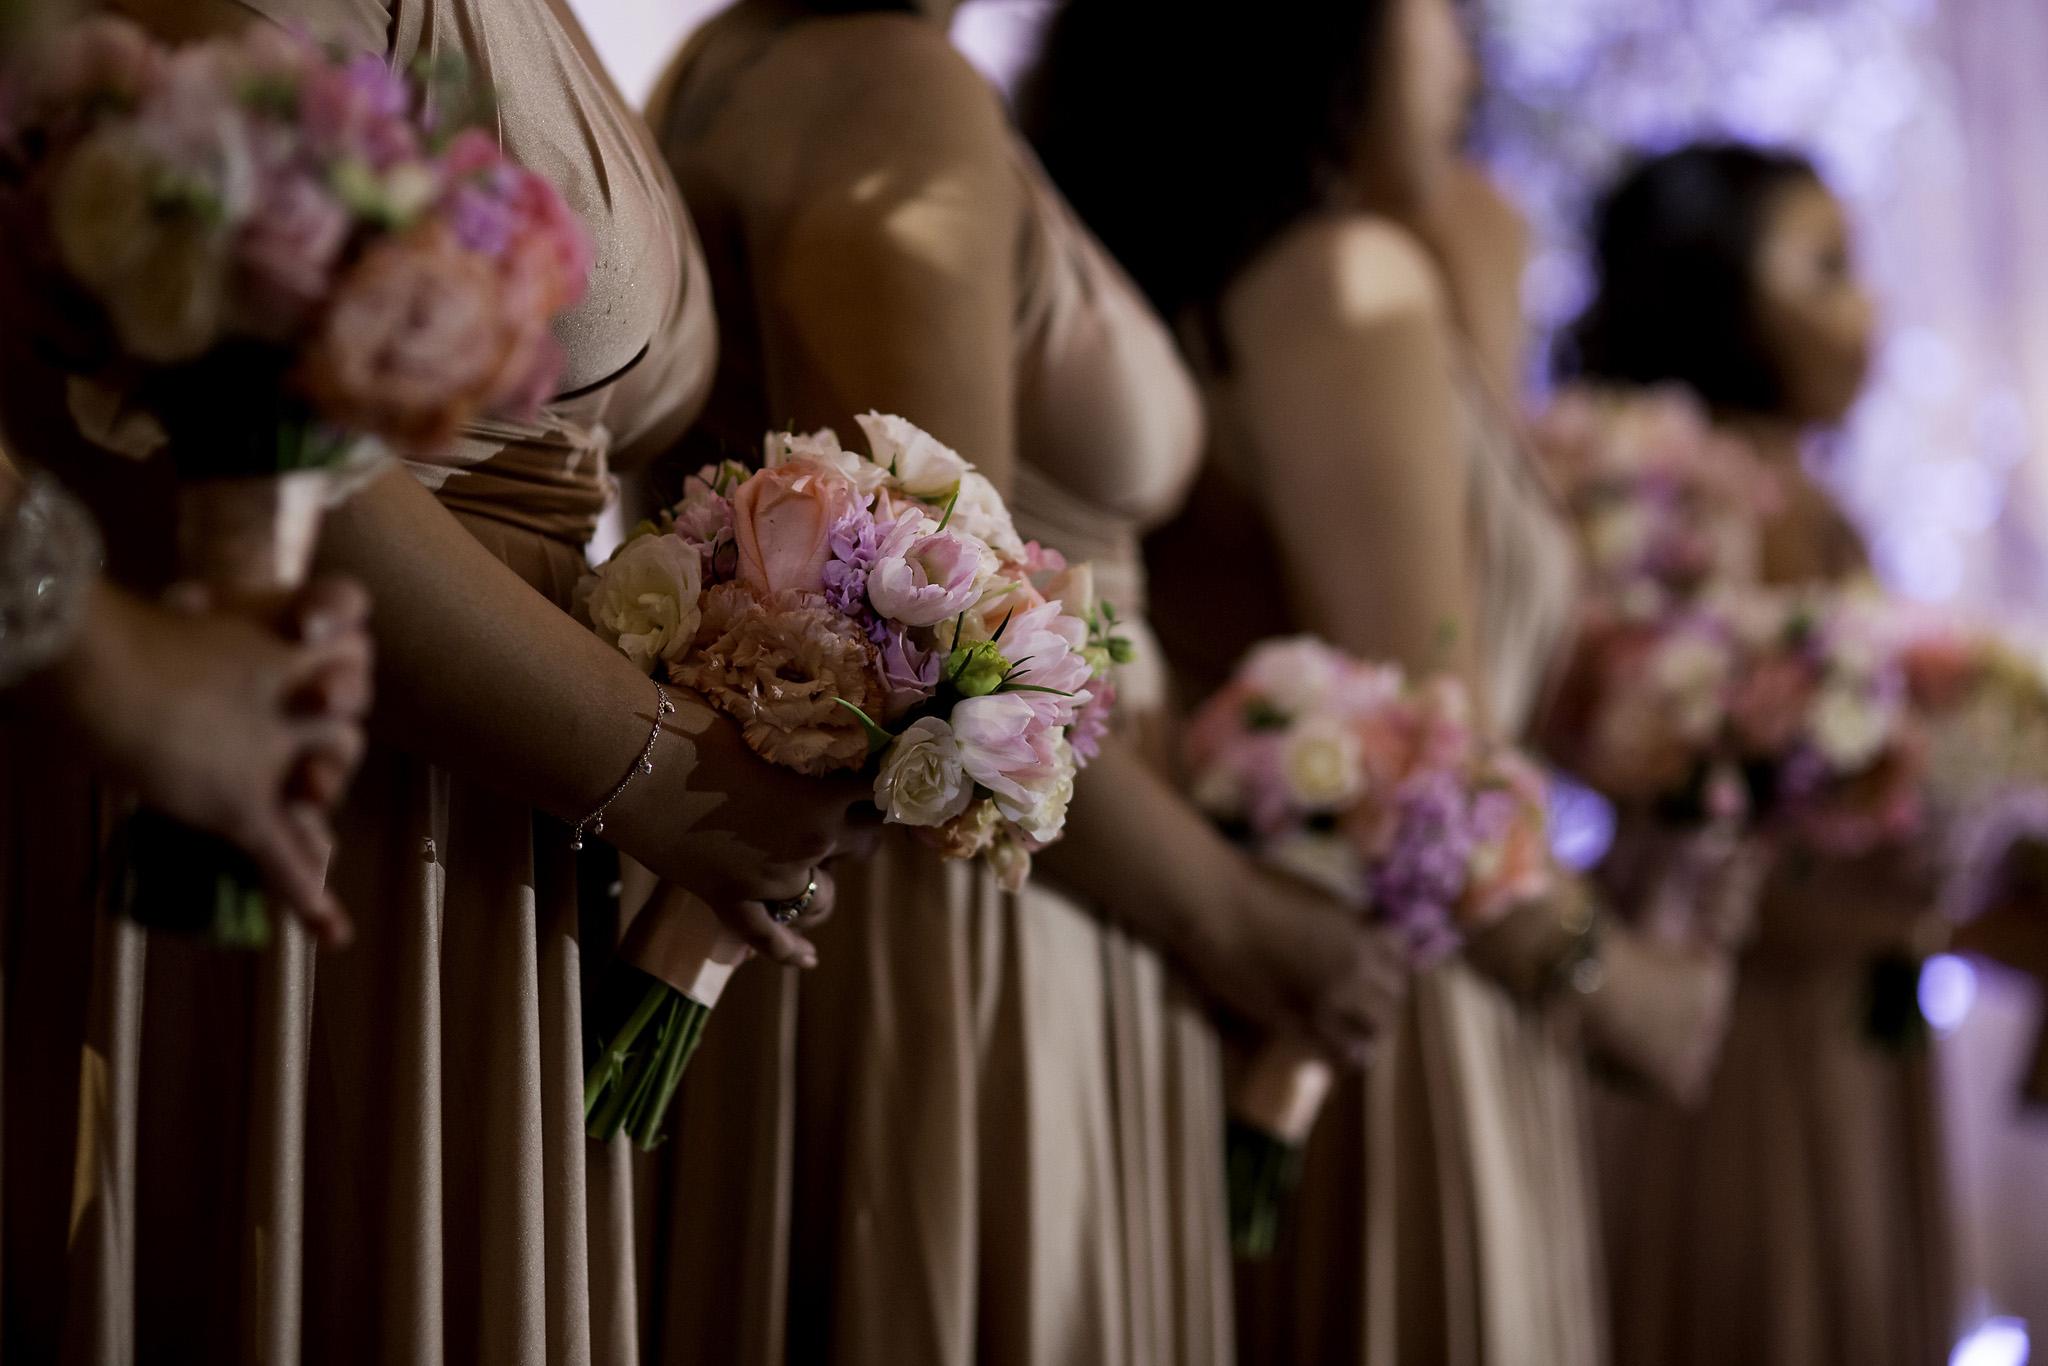 ivie-joy-floral-arts-wedding-photography-hendrick-moy- (30).jpg